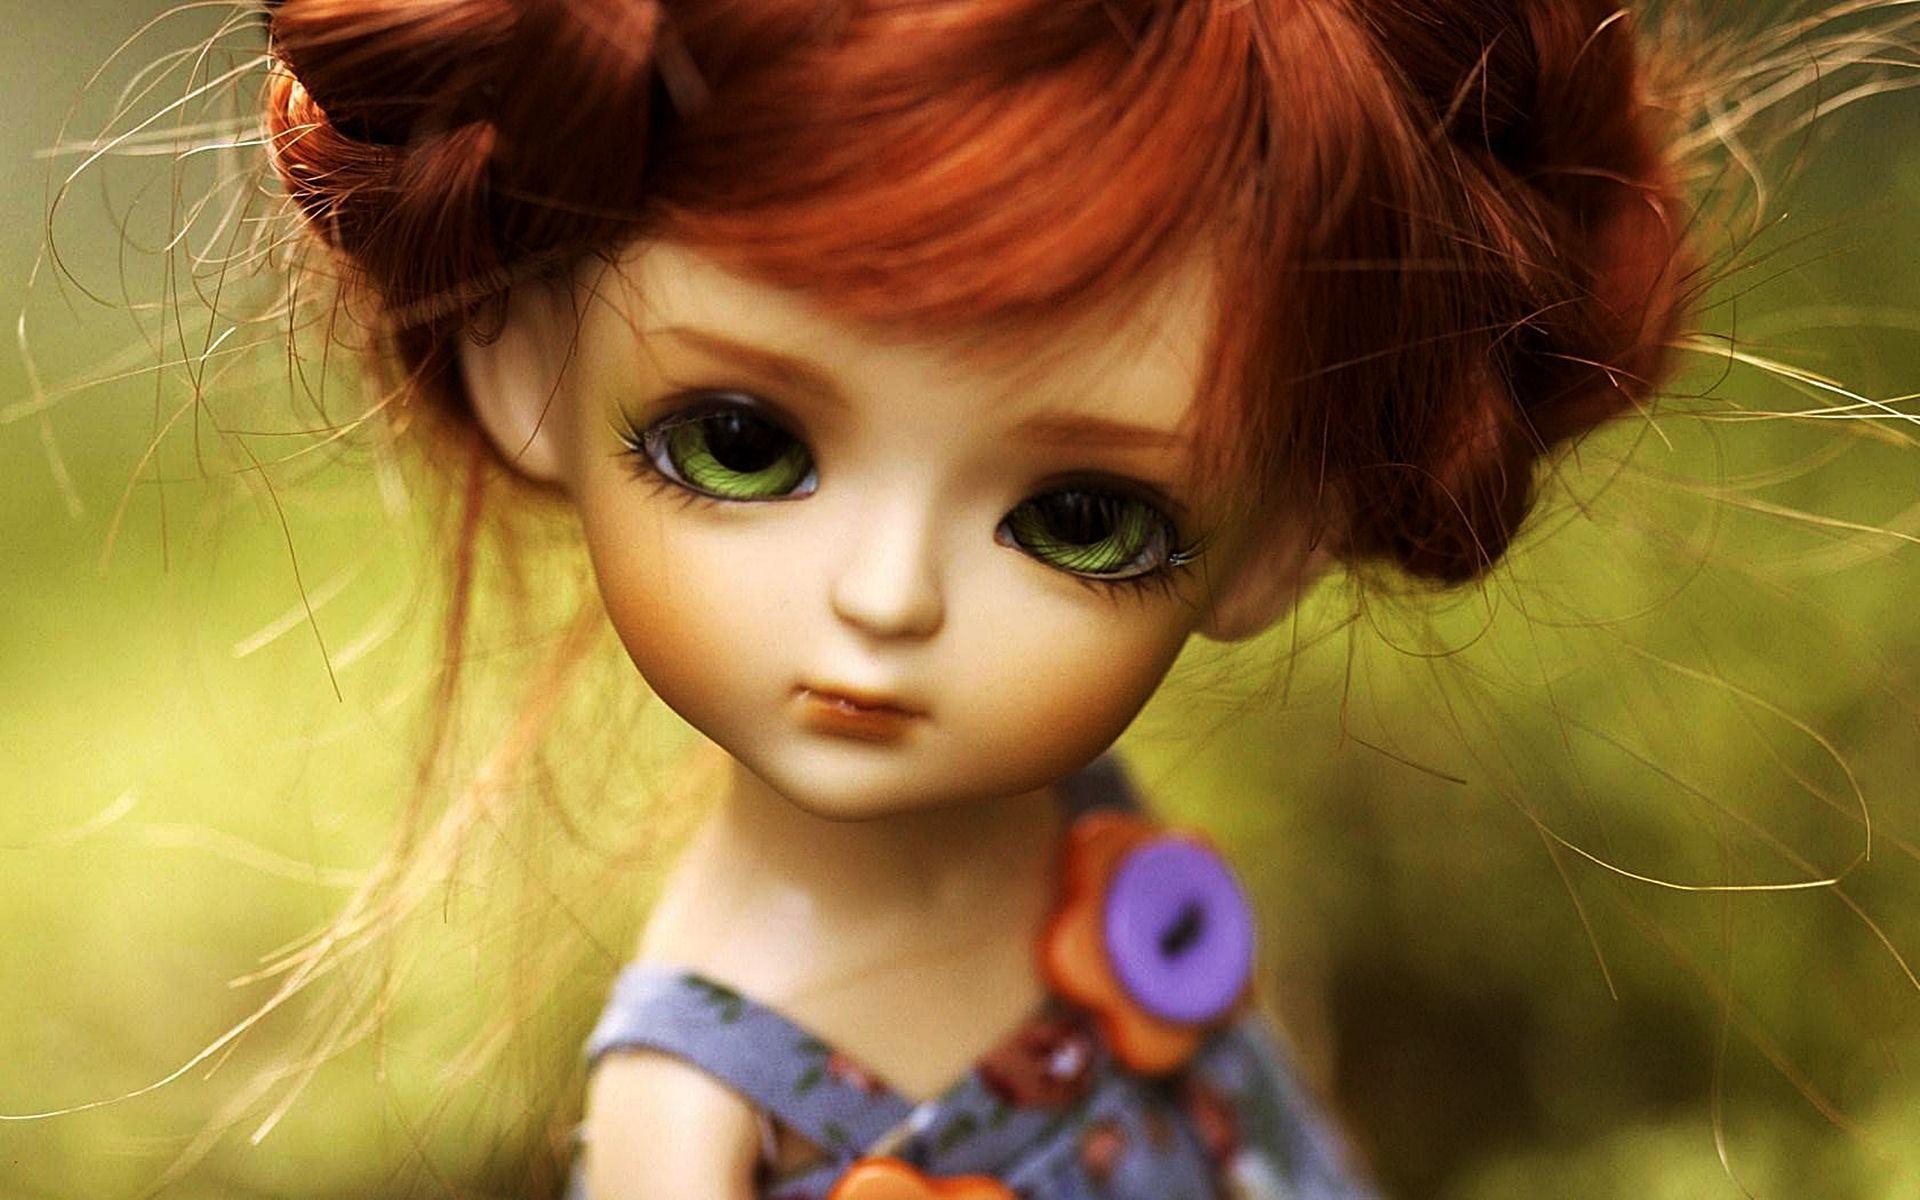 Baby Doll Hd Wallpapers Cute Dolls Beautiful Dolls Dolls Cute doll cute barbie dolls desktop